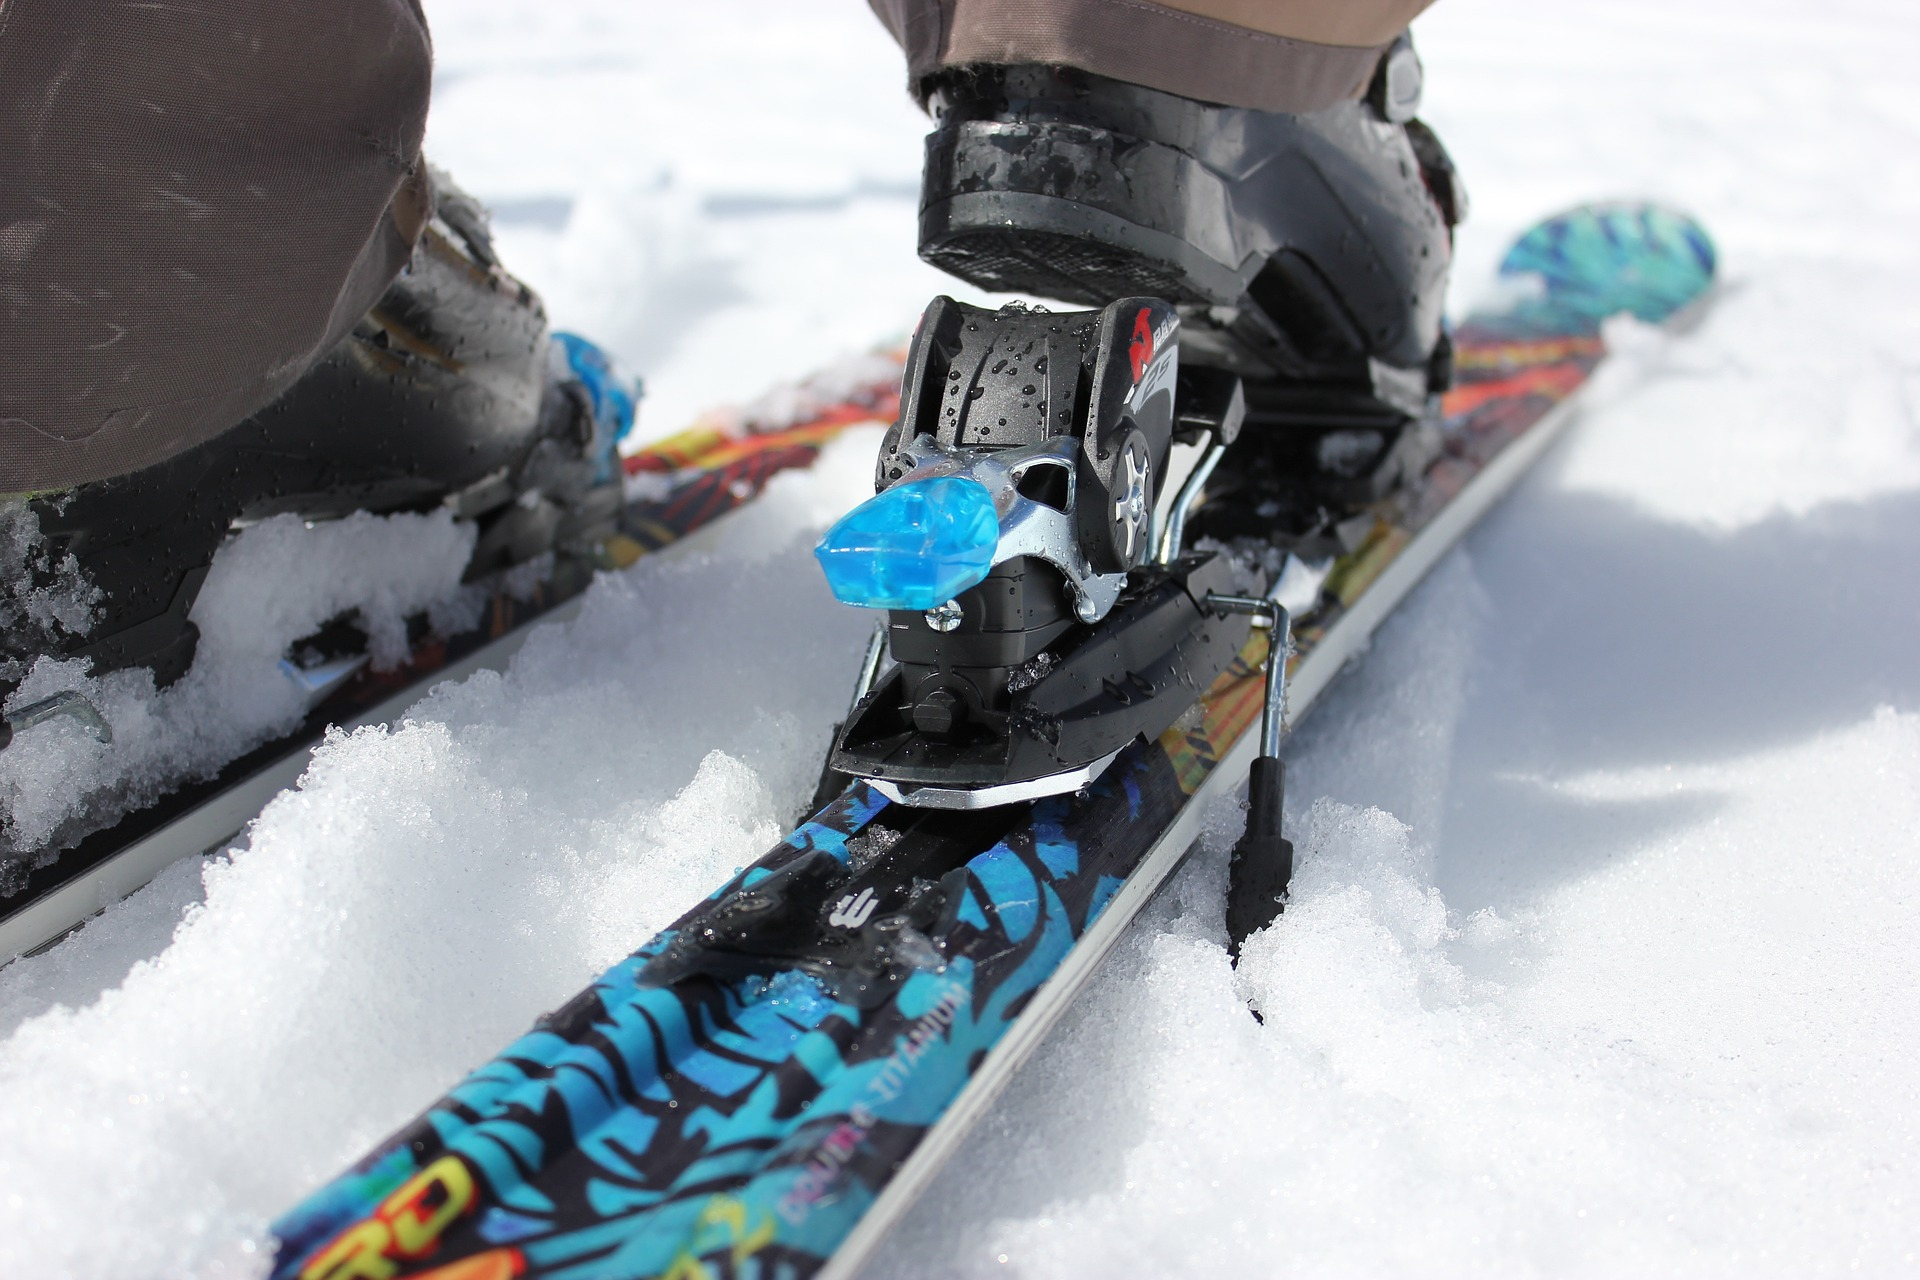 Hvordan står man på ski